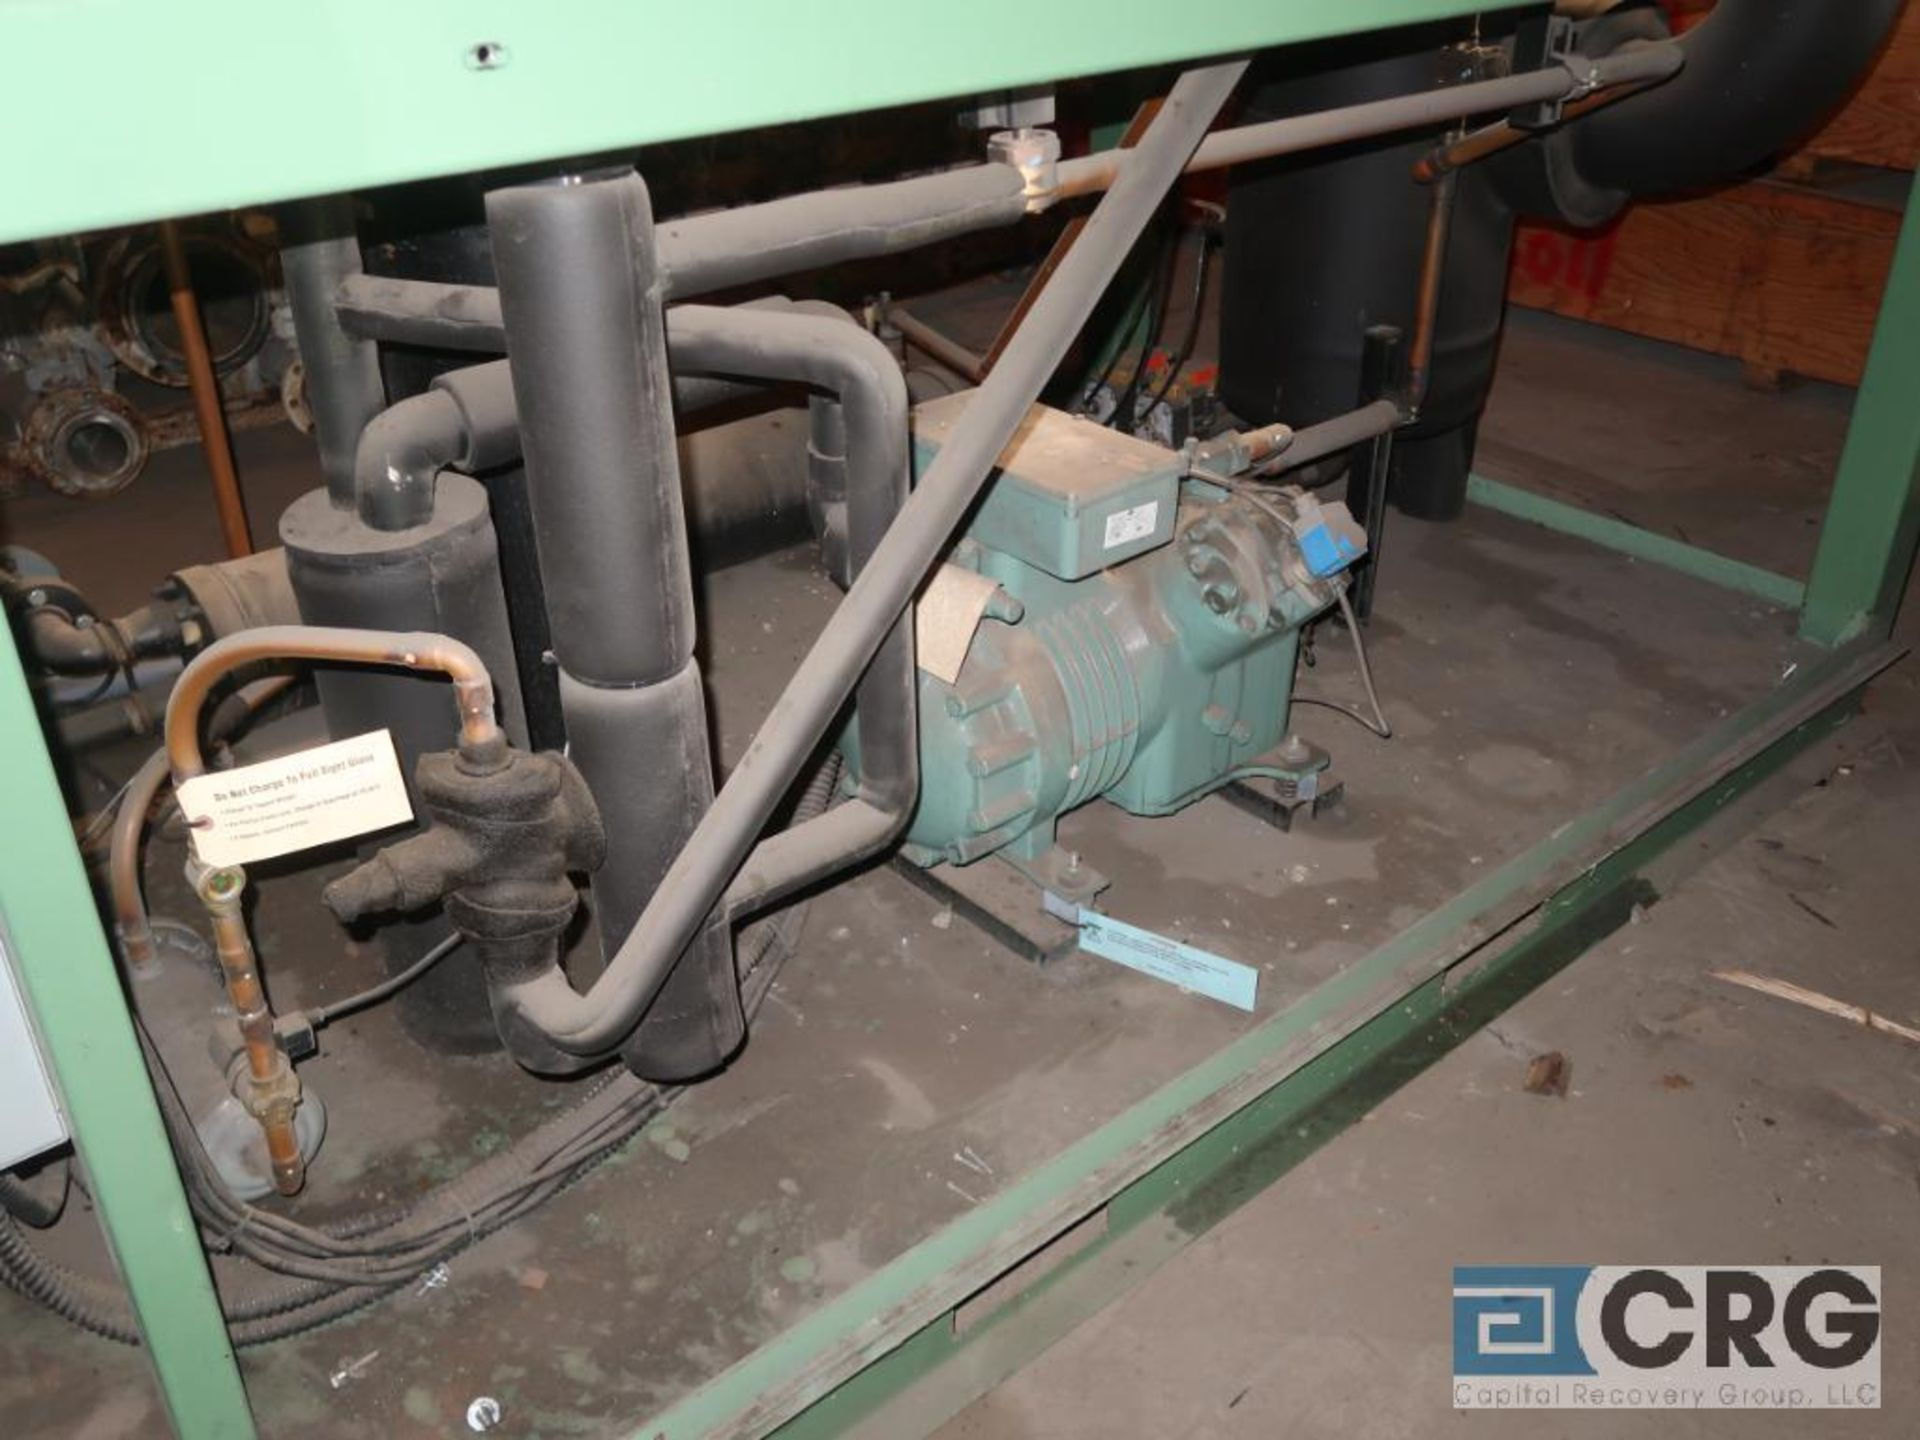 Cameron DC4000 W4 refrigeration/air dryer system, cap. 4,000 SCFM, MWP175, 460 volt (Off Site - Image 4 of 4